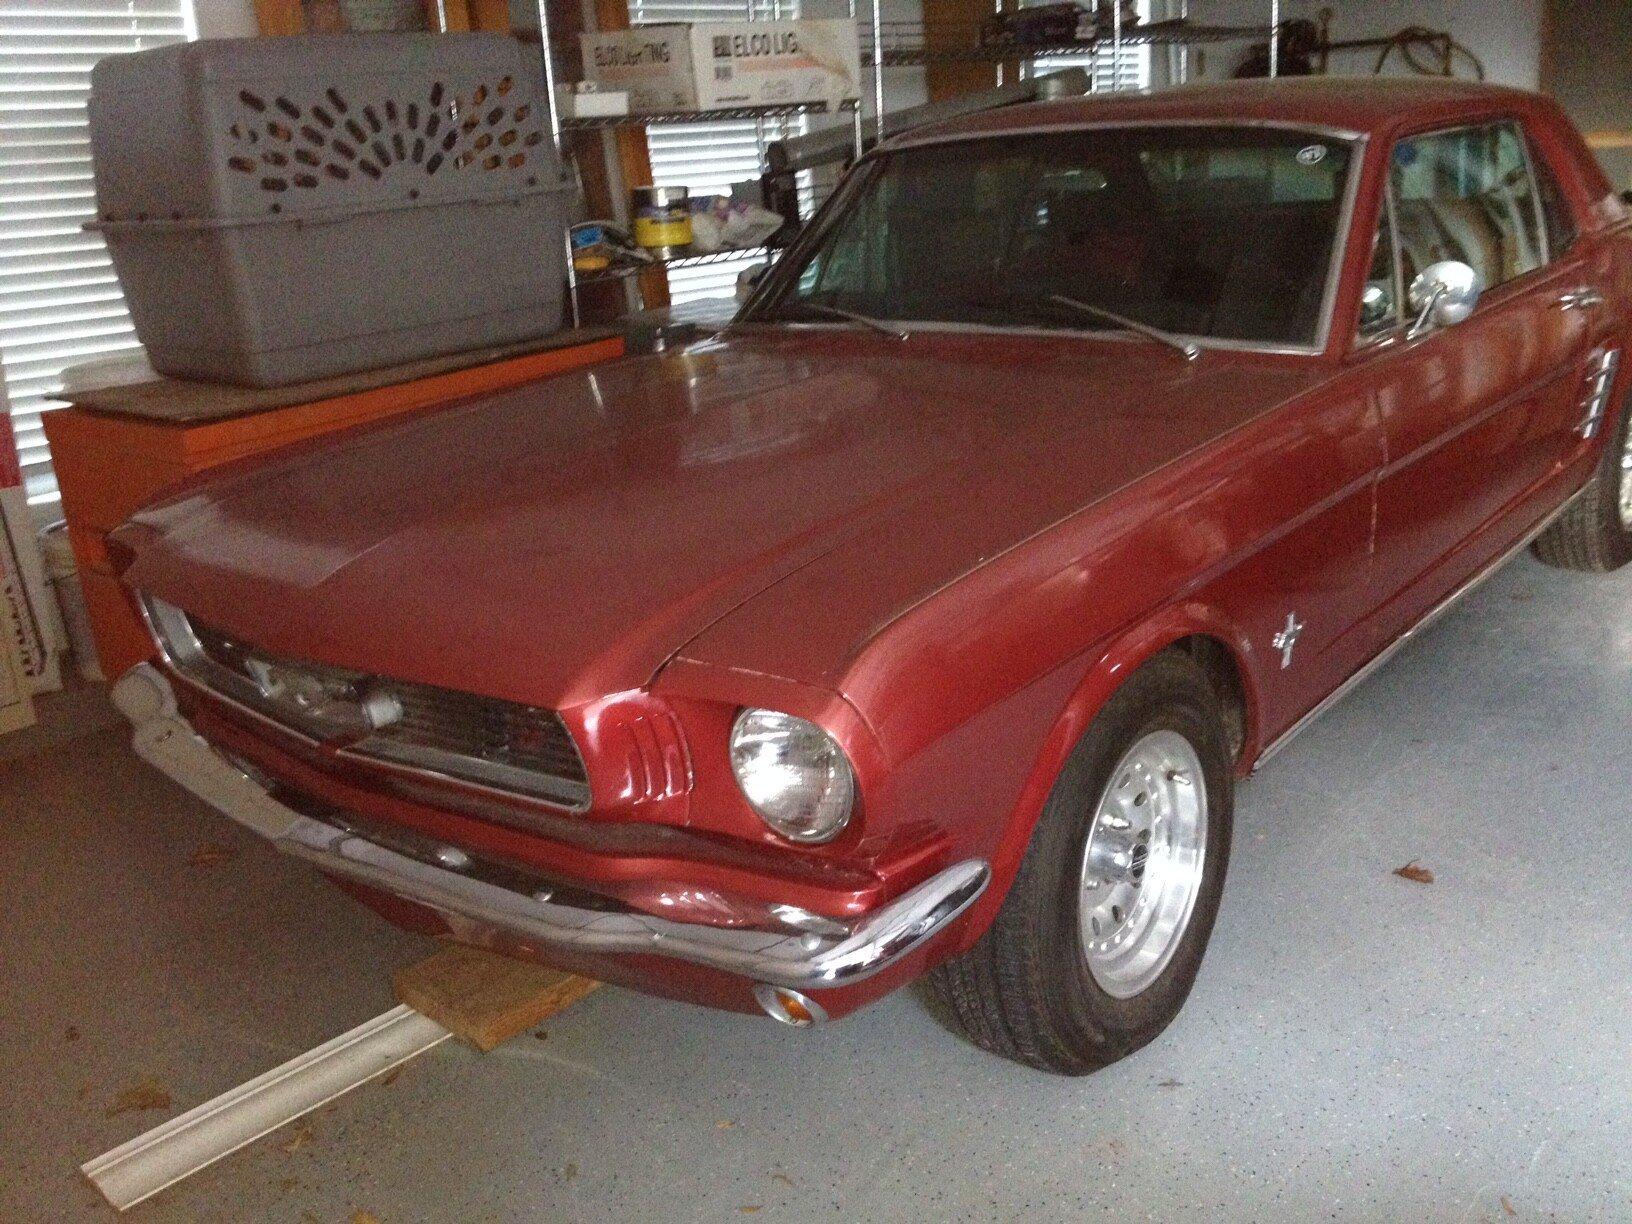 Awesome List Of Pony Cars Ideas - Classic Cars Ideas - boiq.info